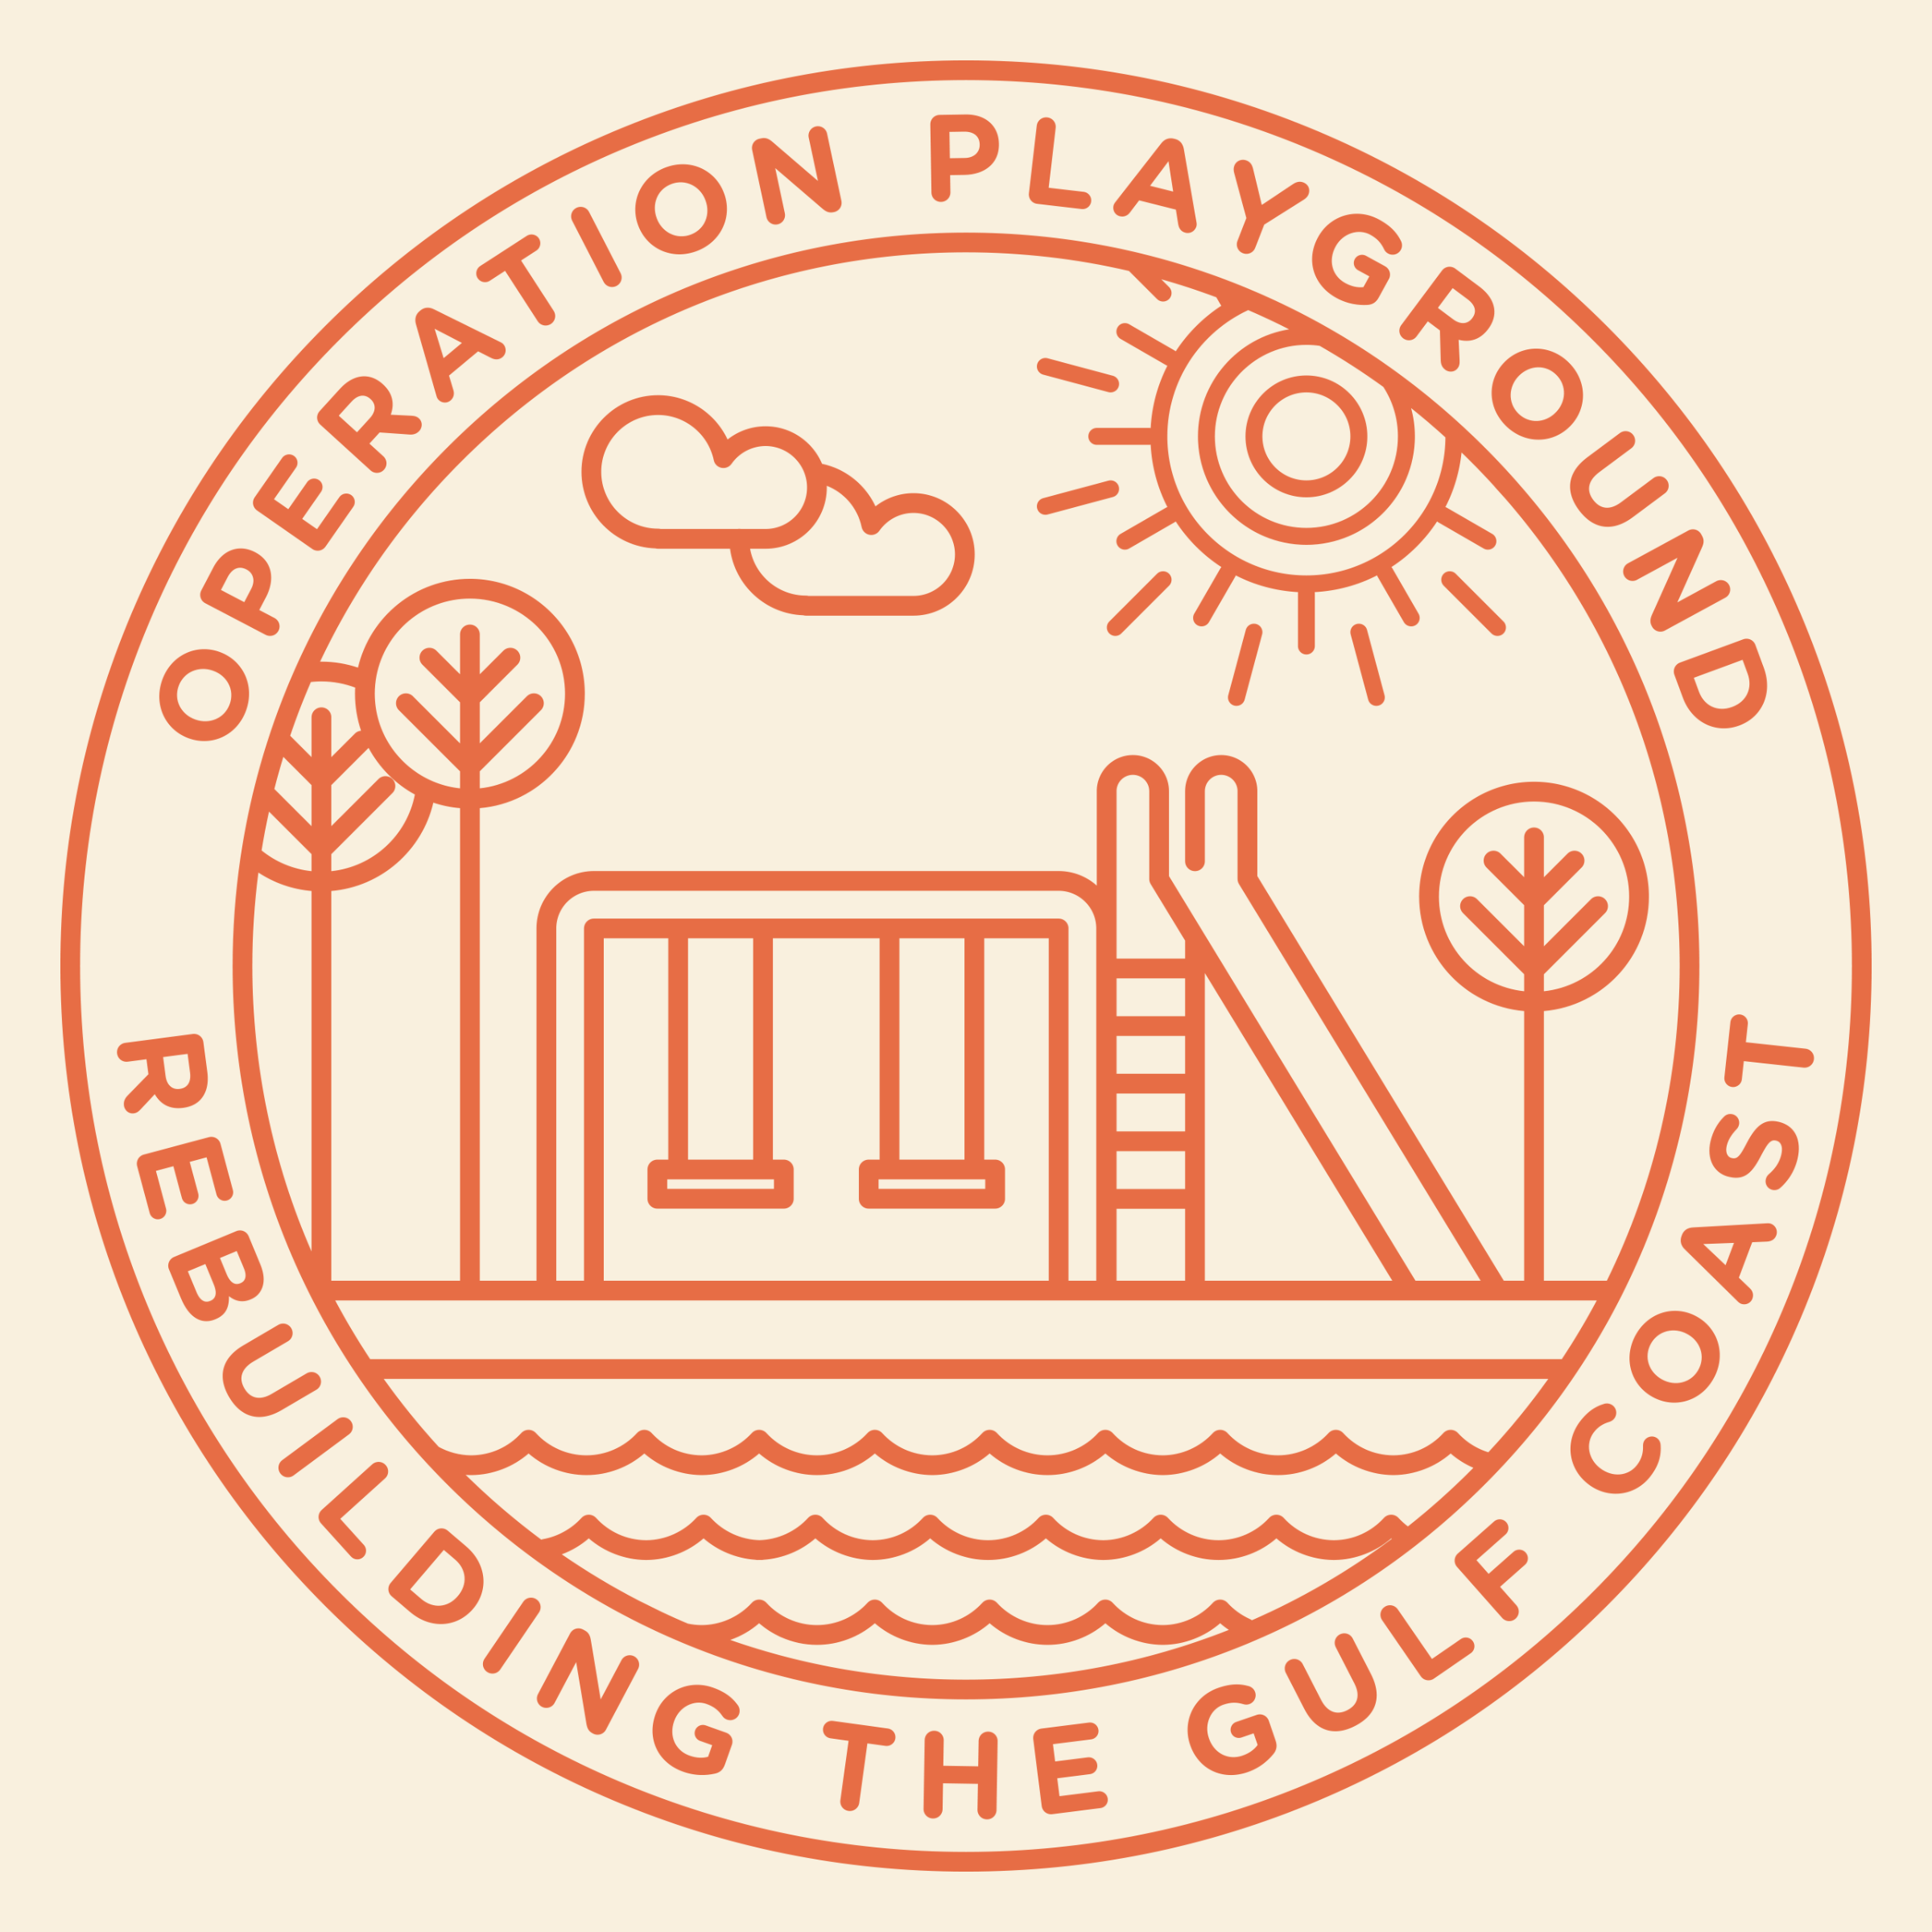 Operation Playground: Rebuilding the Gulf Coast